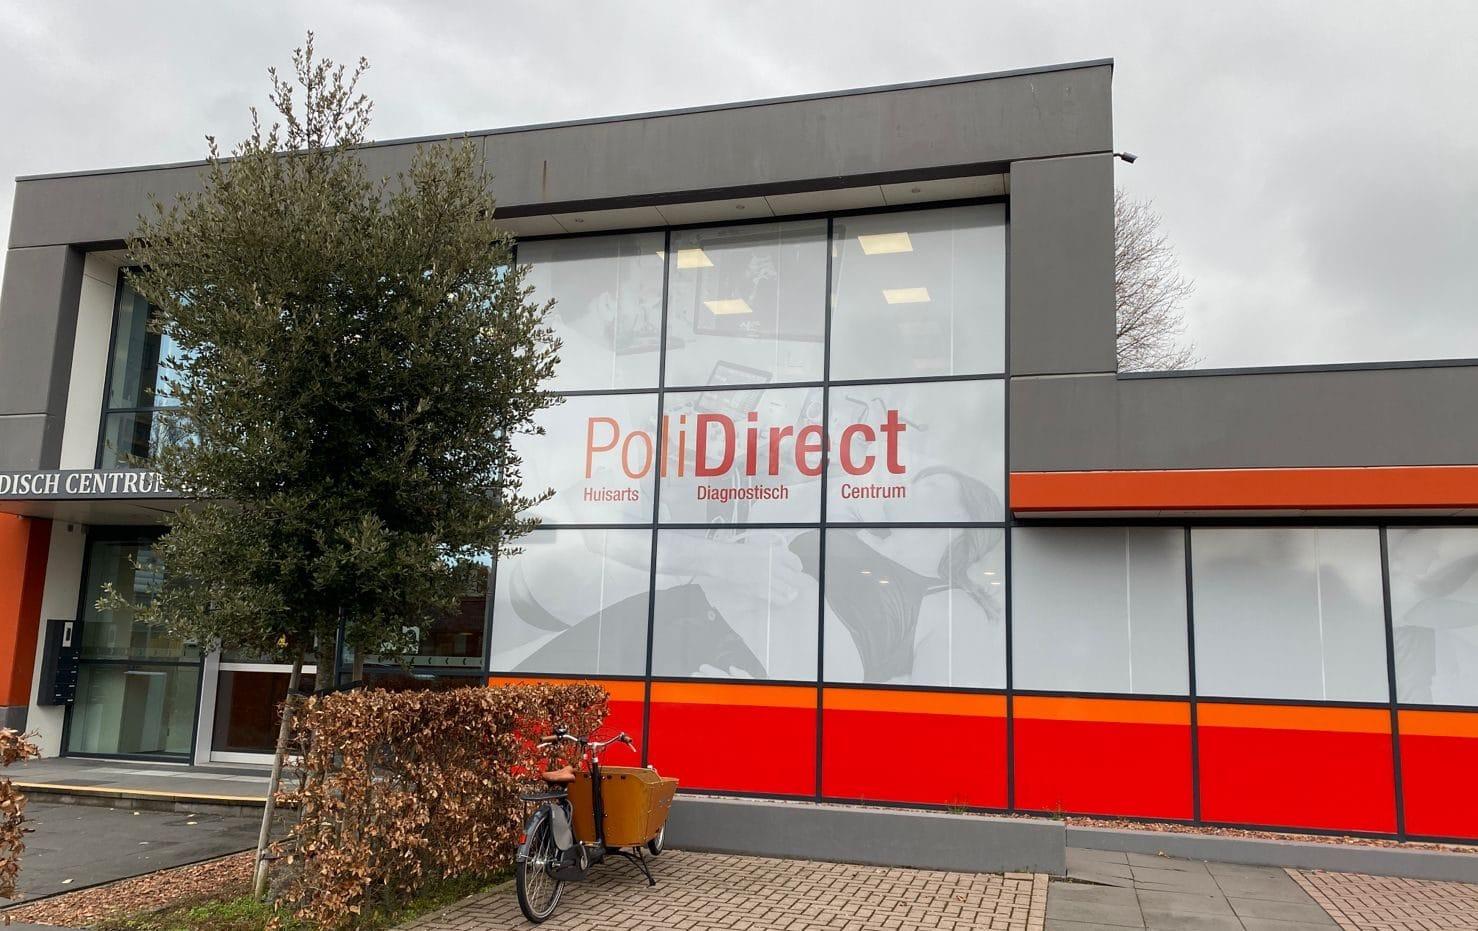 PoliDirect Dordrecht HDC